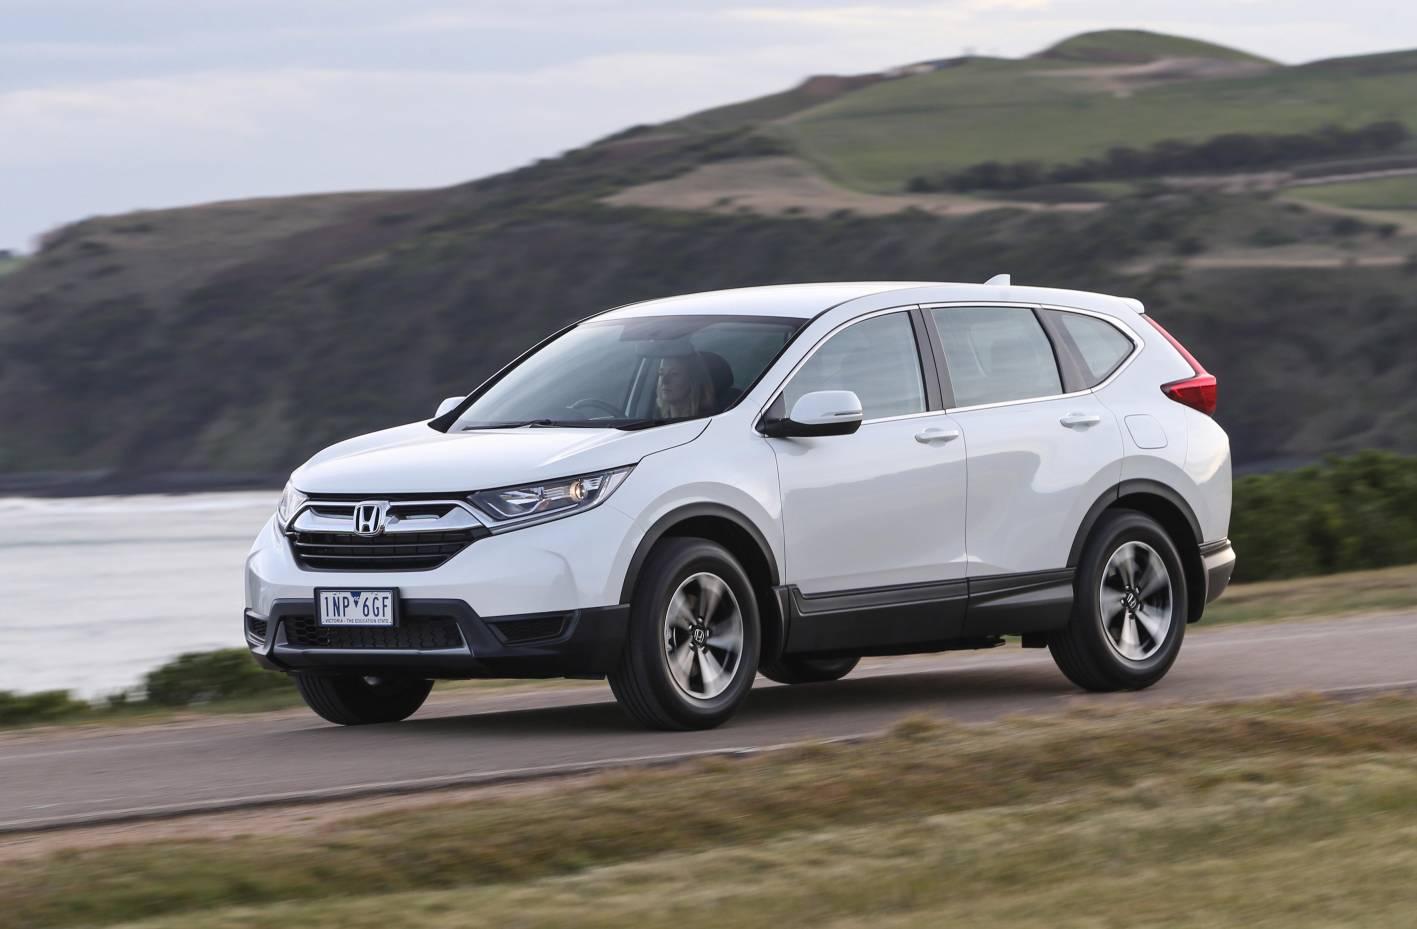 Honda CR-V Vi 2019 Review | Practical Motoring